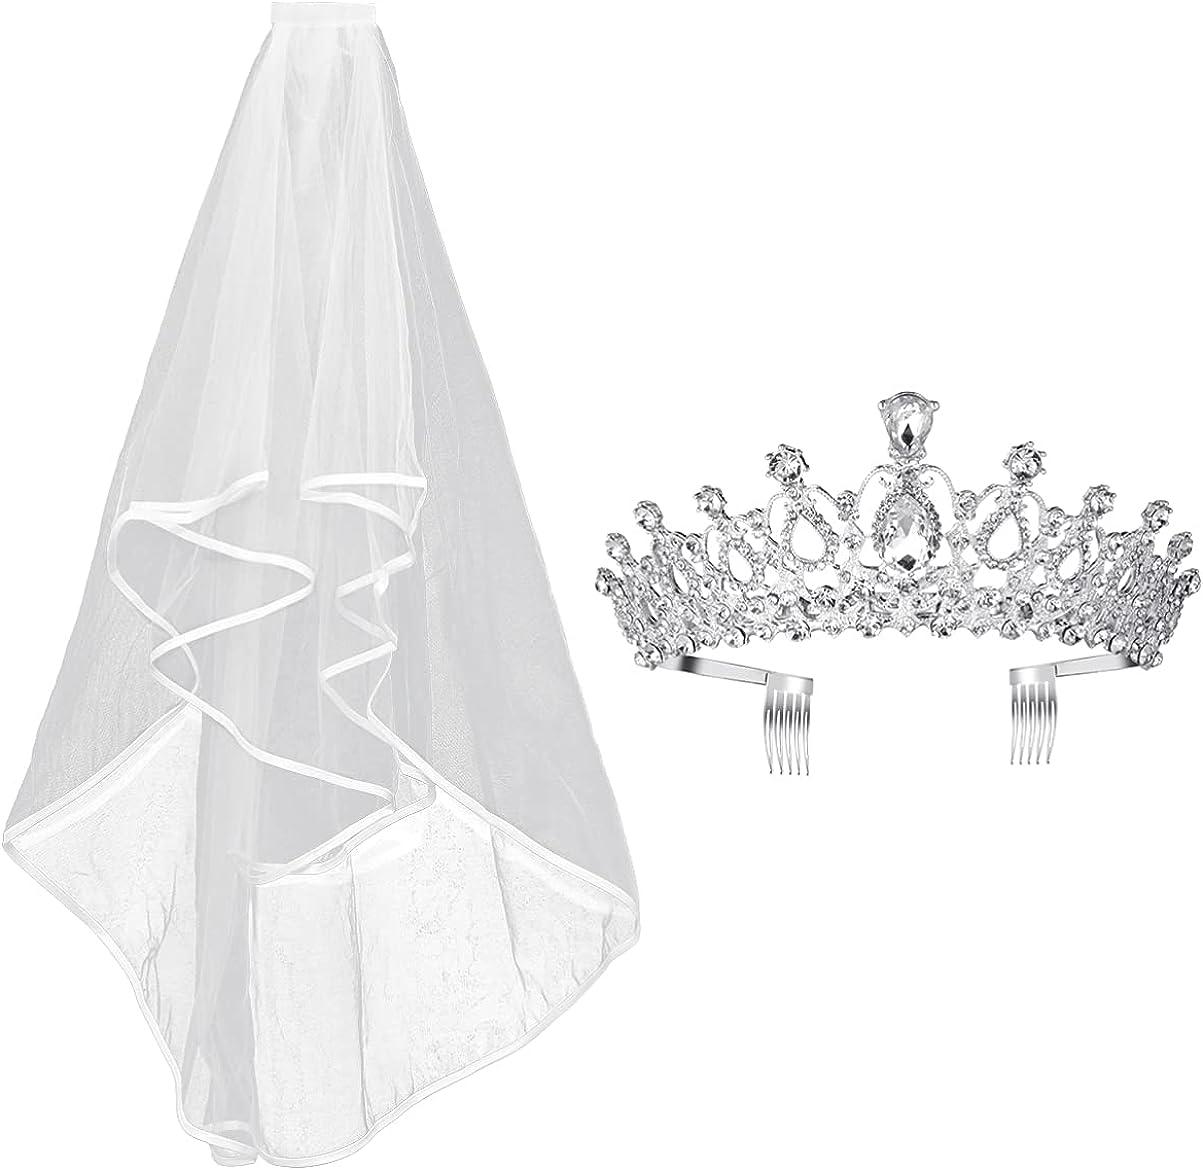 FRCOLOR Royal Wedding Crown Veil with Comb Crystal Crown Princess Tiara Headpiece Bridal Wedding Veil Heardress